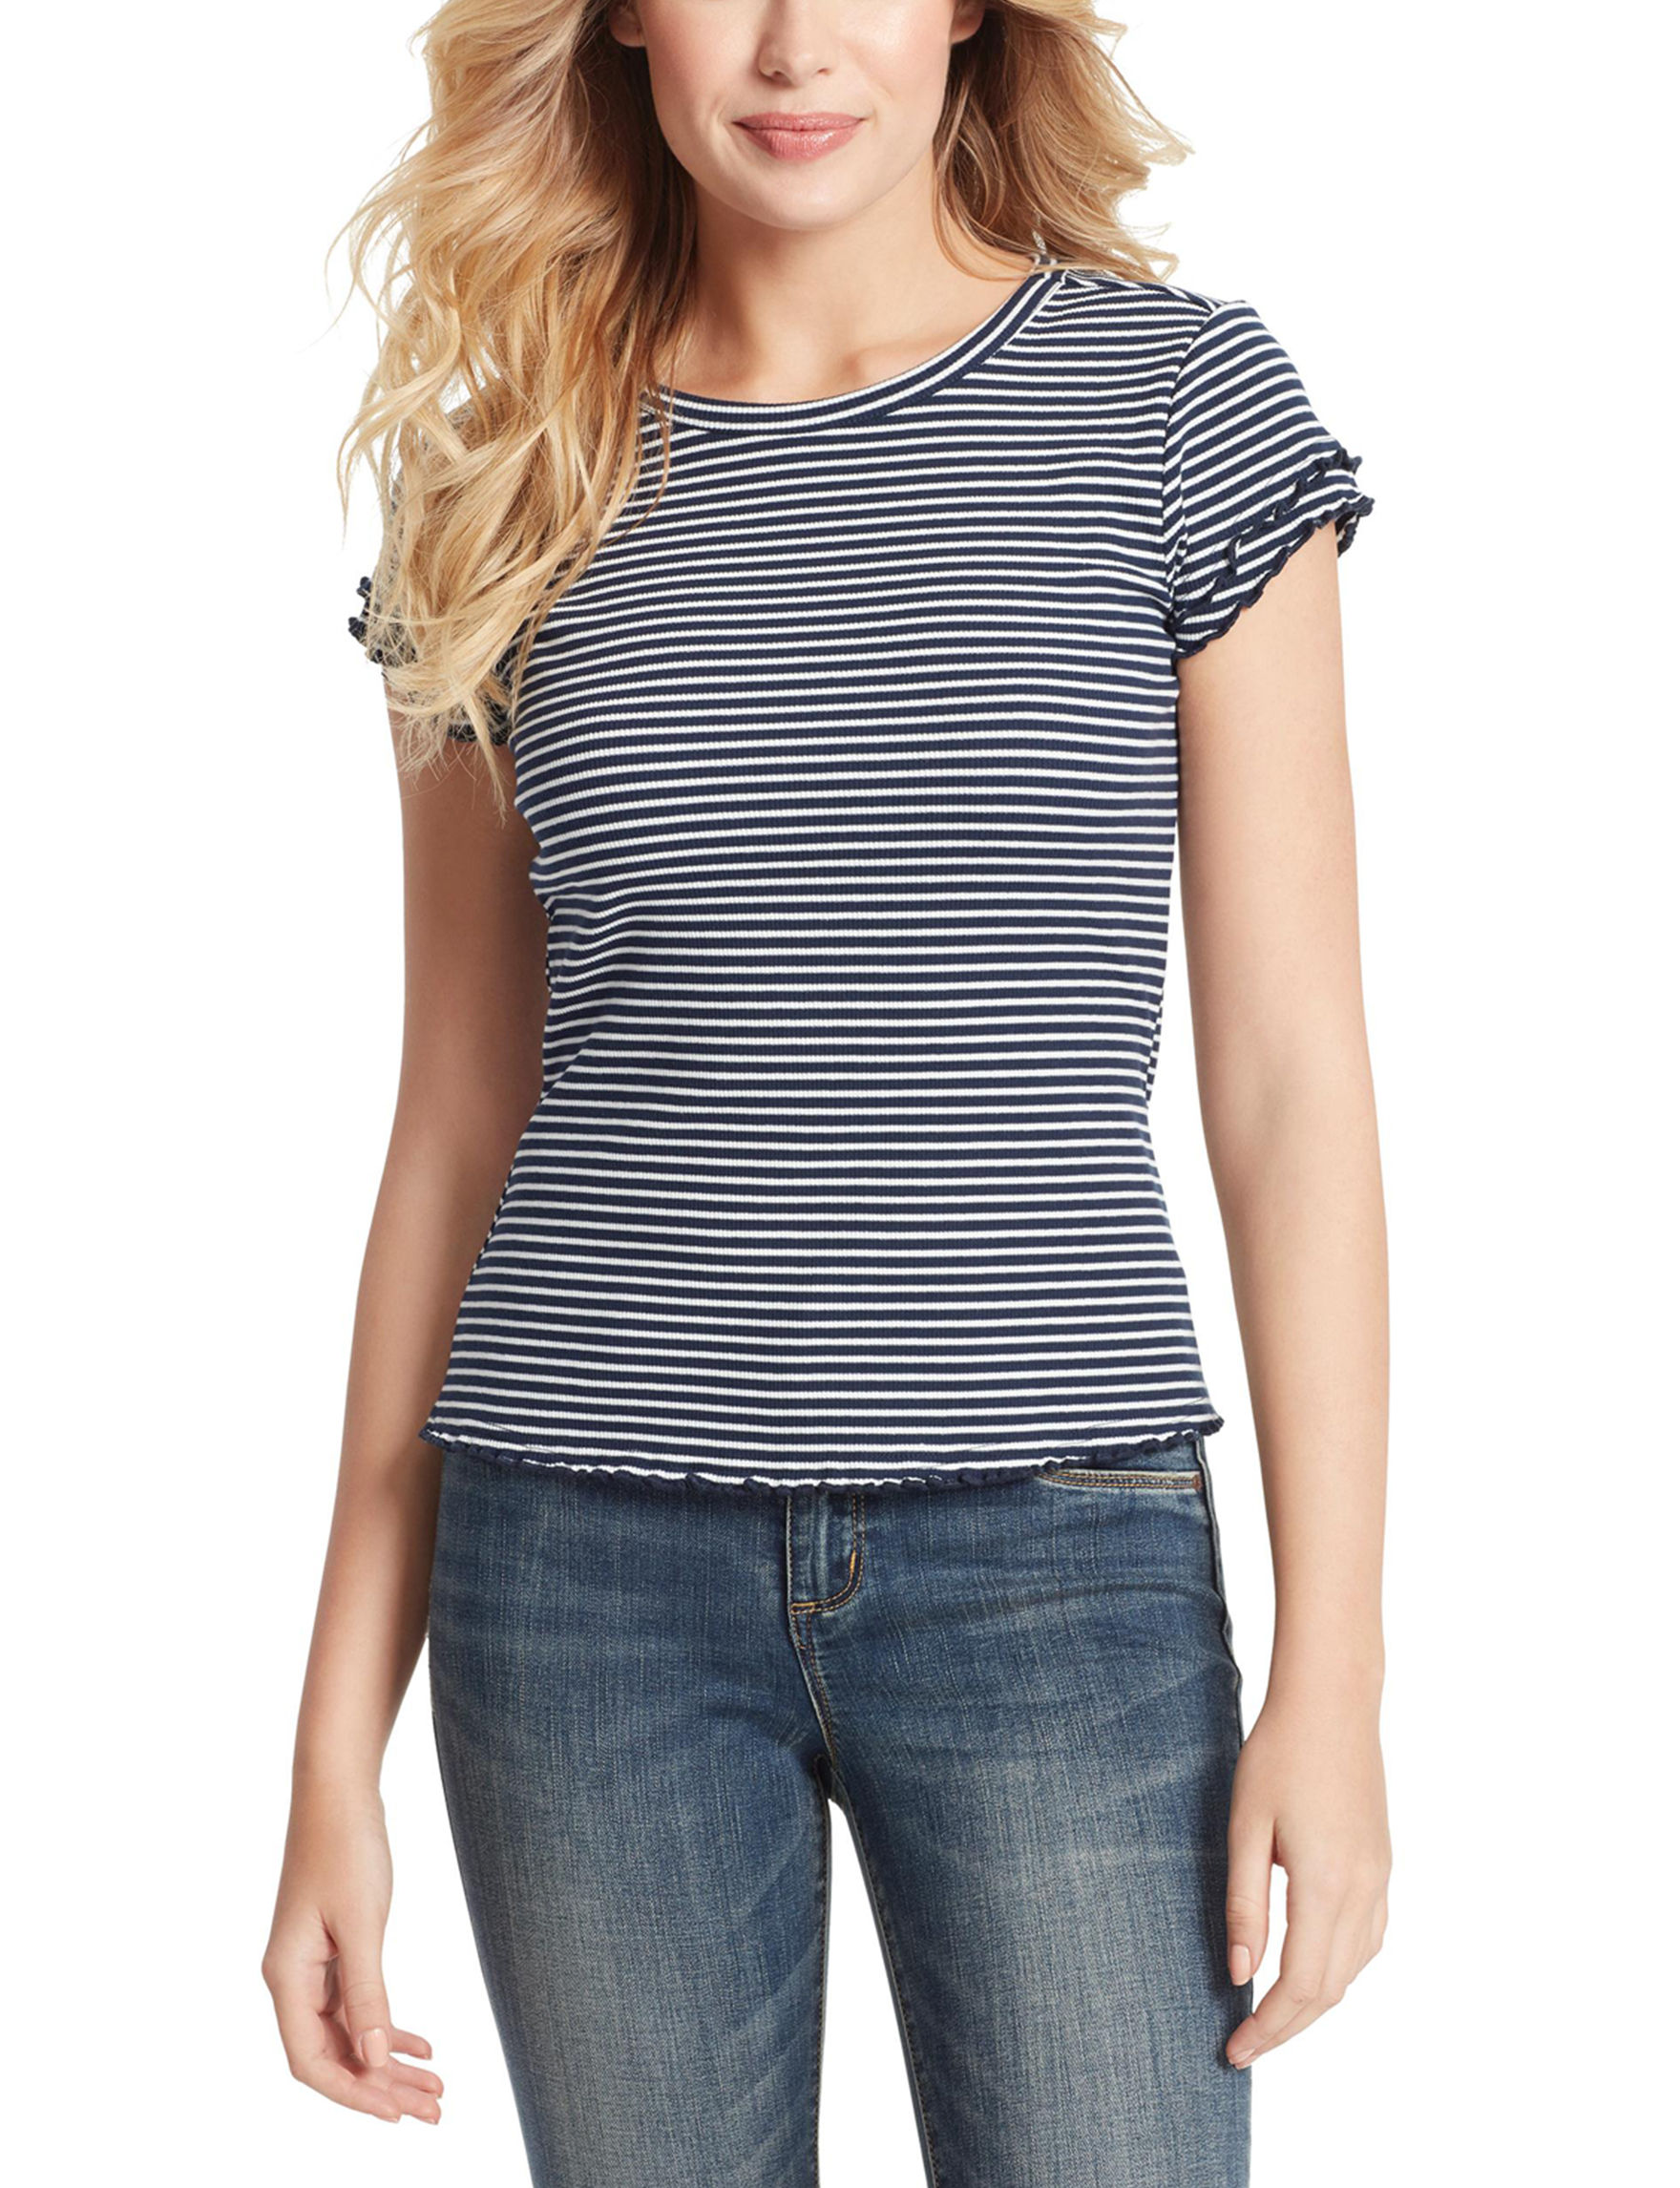 Jessica Simpson Navy Stripe Shirts & Blouses